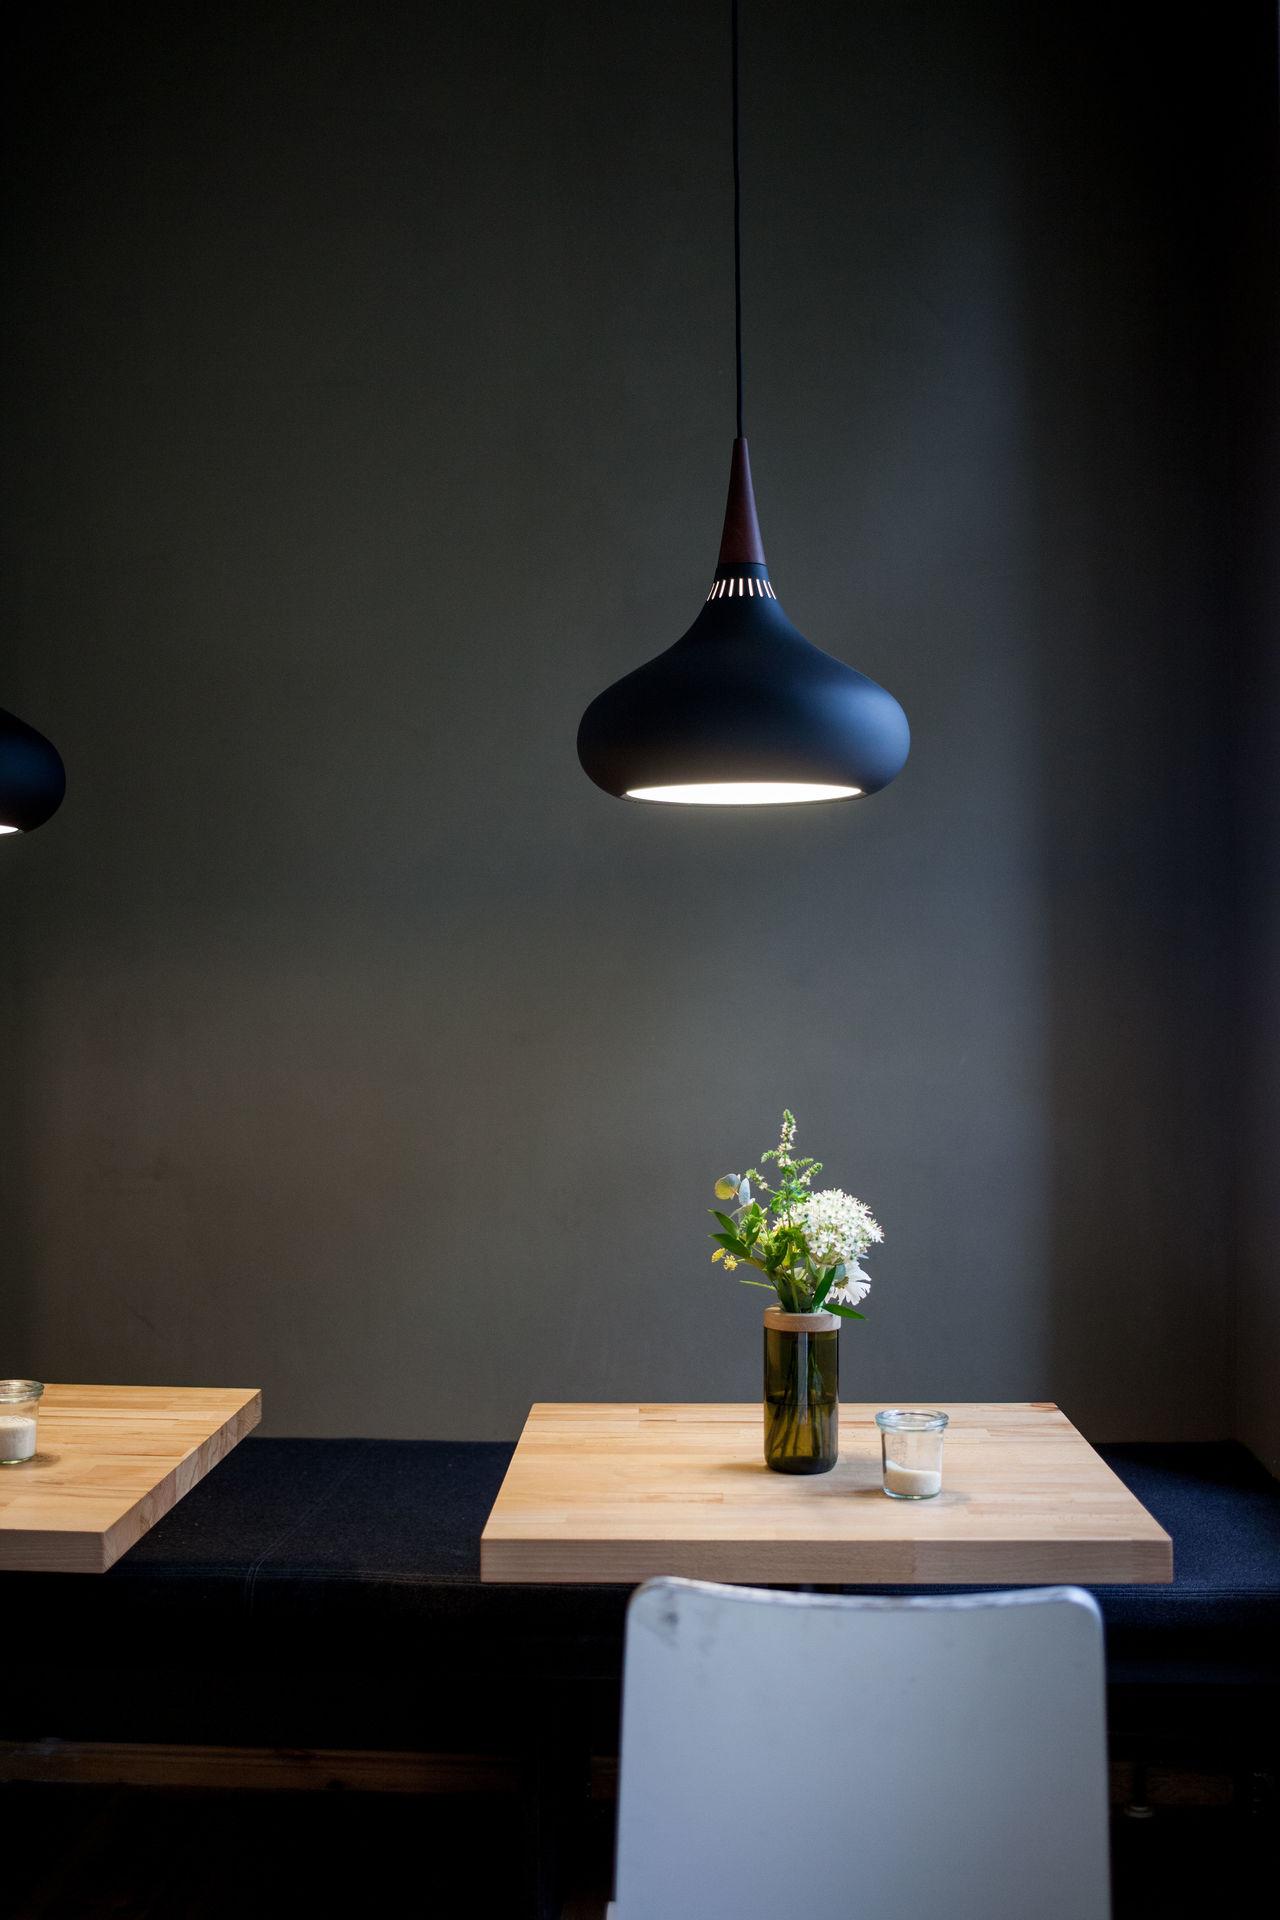 Cafe Close-up Dark Decor Decoration Design Electric Lamp Illuminated Interior Interior Design Lamp Lifestyle Lighting Equipment Lit No People Still Life Stils